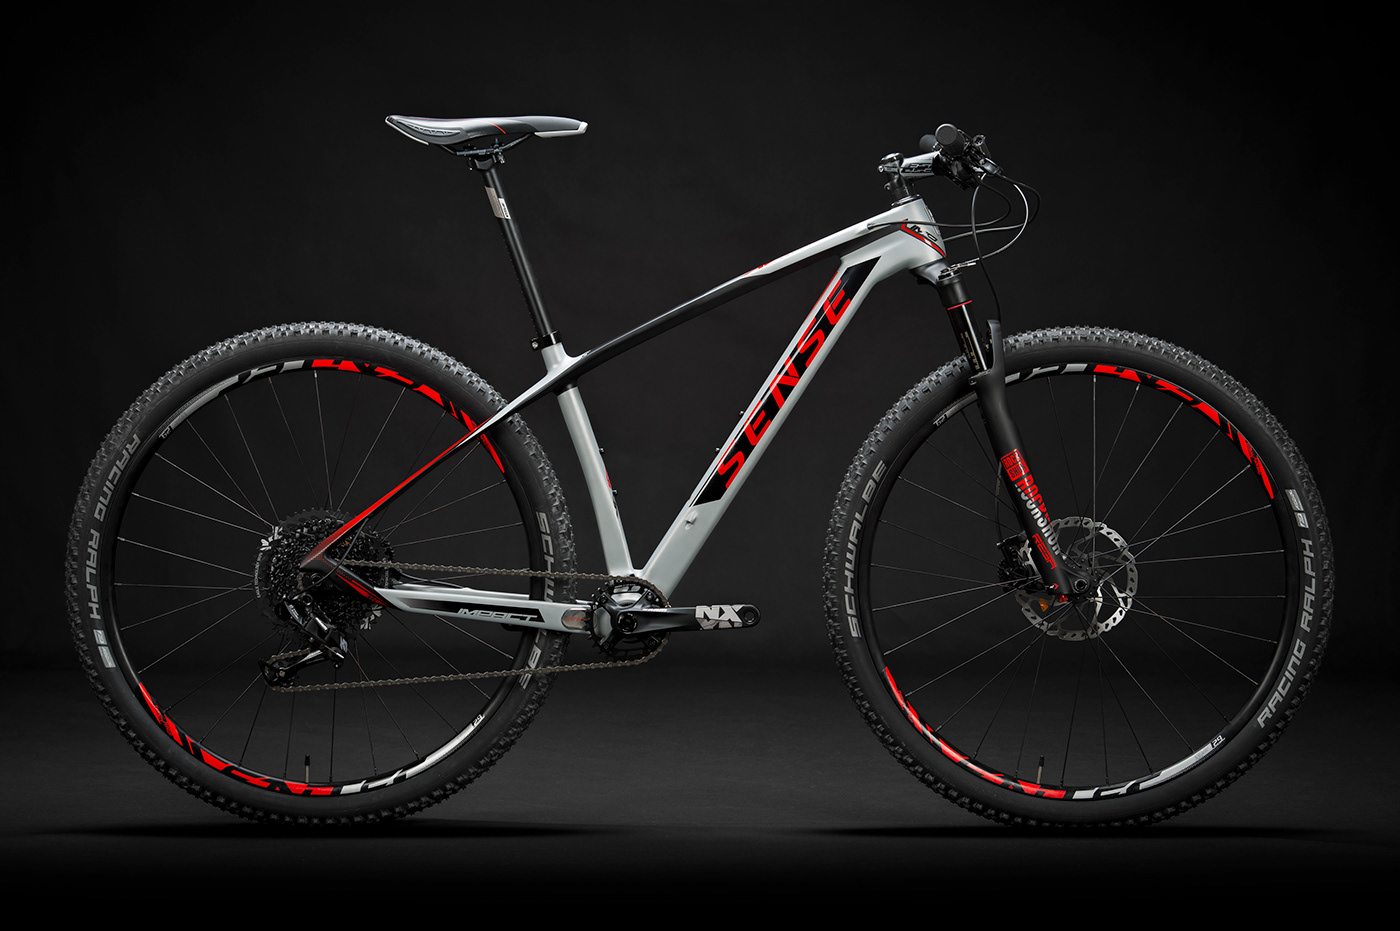 Gabriel Delfino Delfino Design carbon bike carbon Bike bicicleta cycle Design Brasileiro road MTB